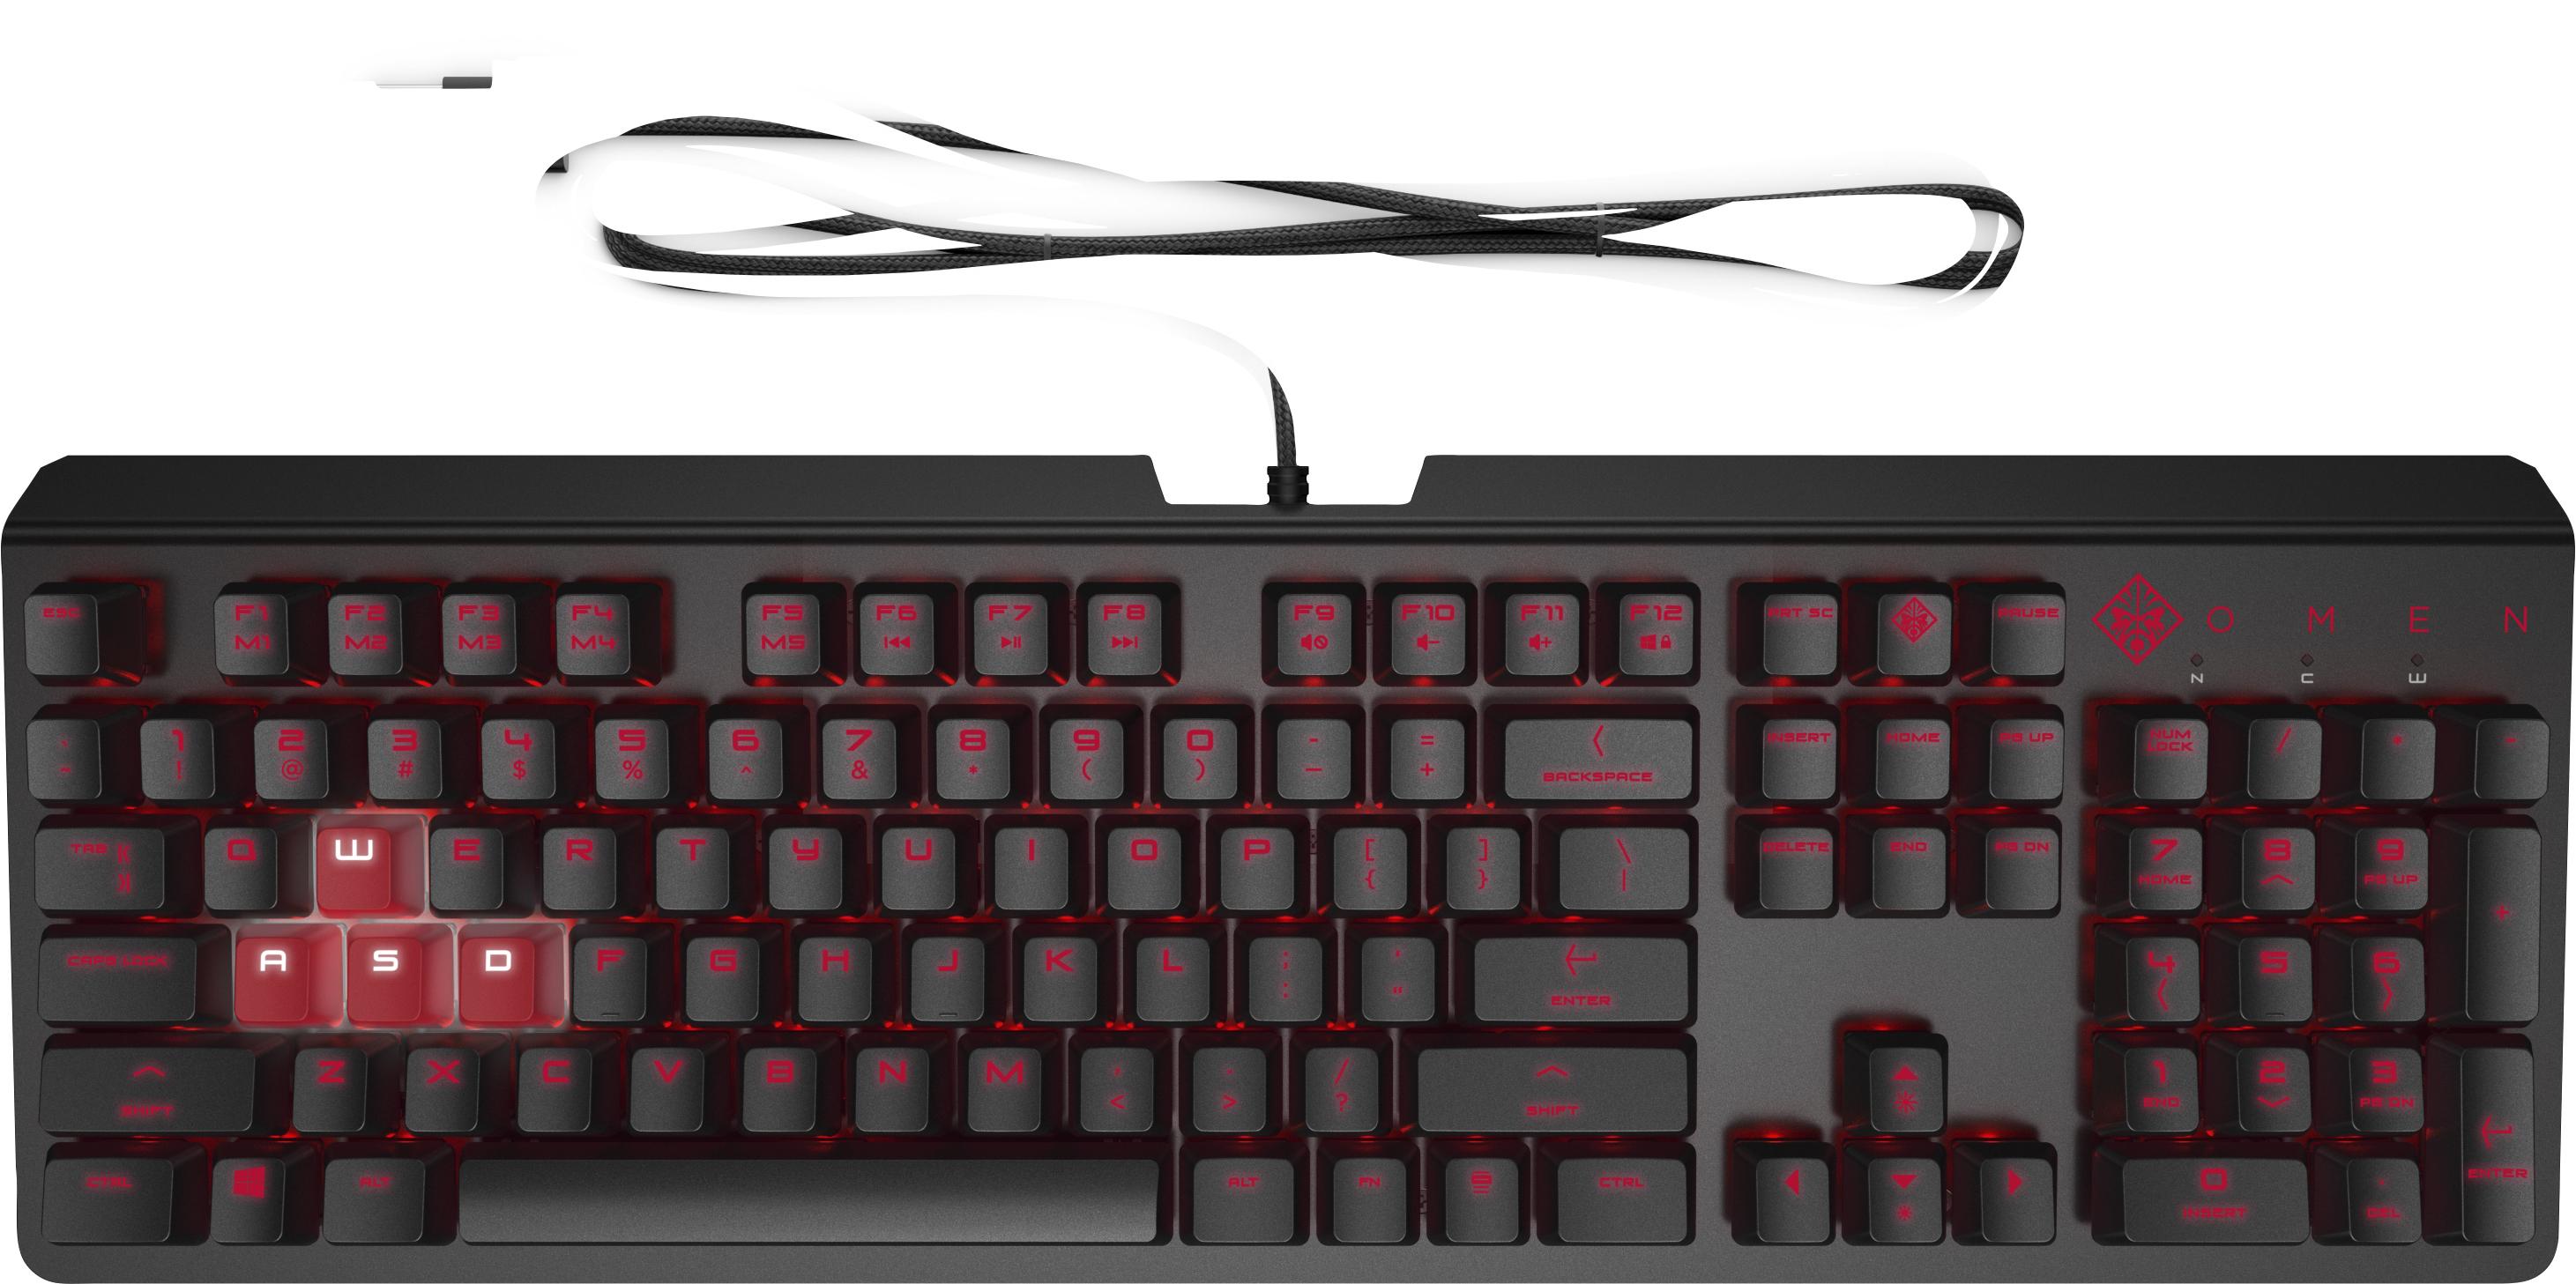 Omen By HP Encoder Keyboard Brown/Cherry